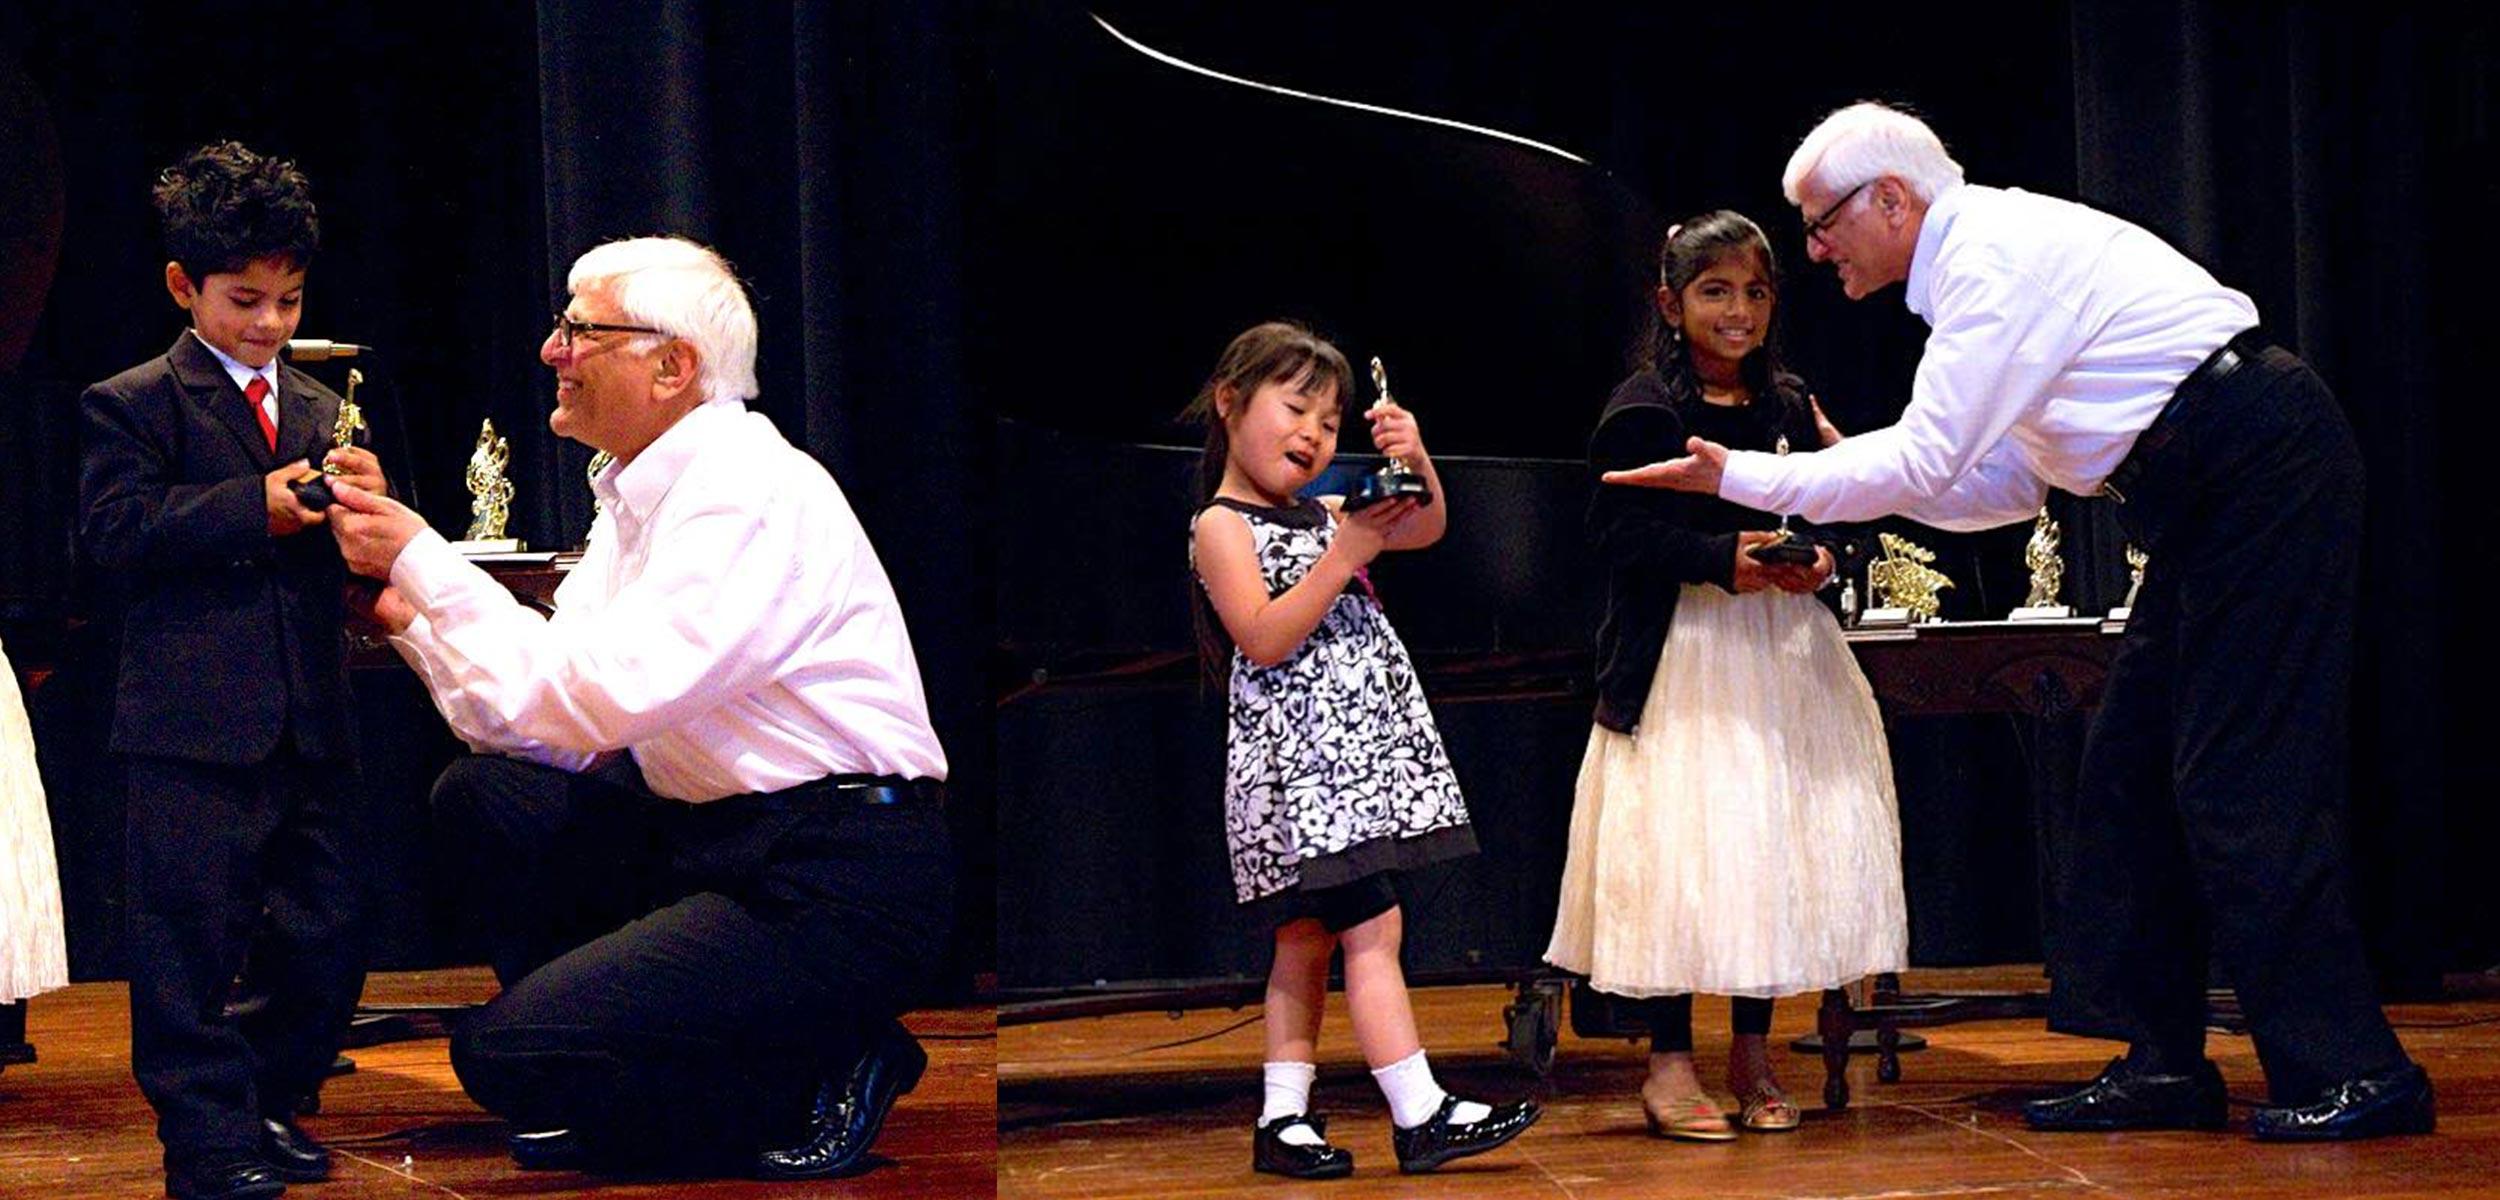 Piano lessons Manhattan - Awards